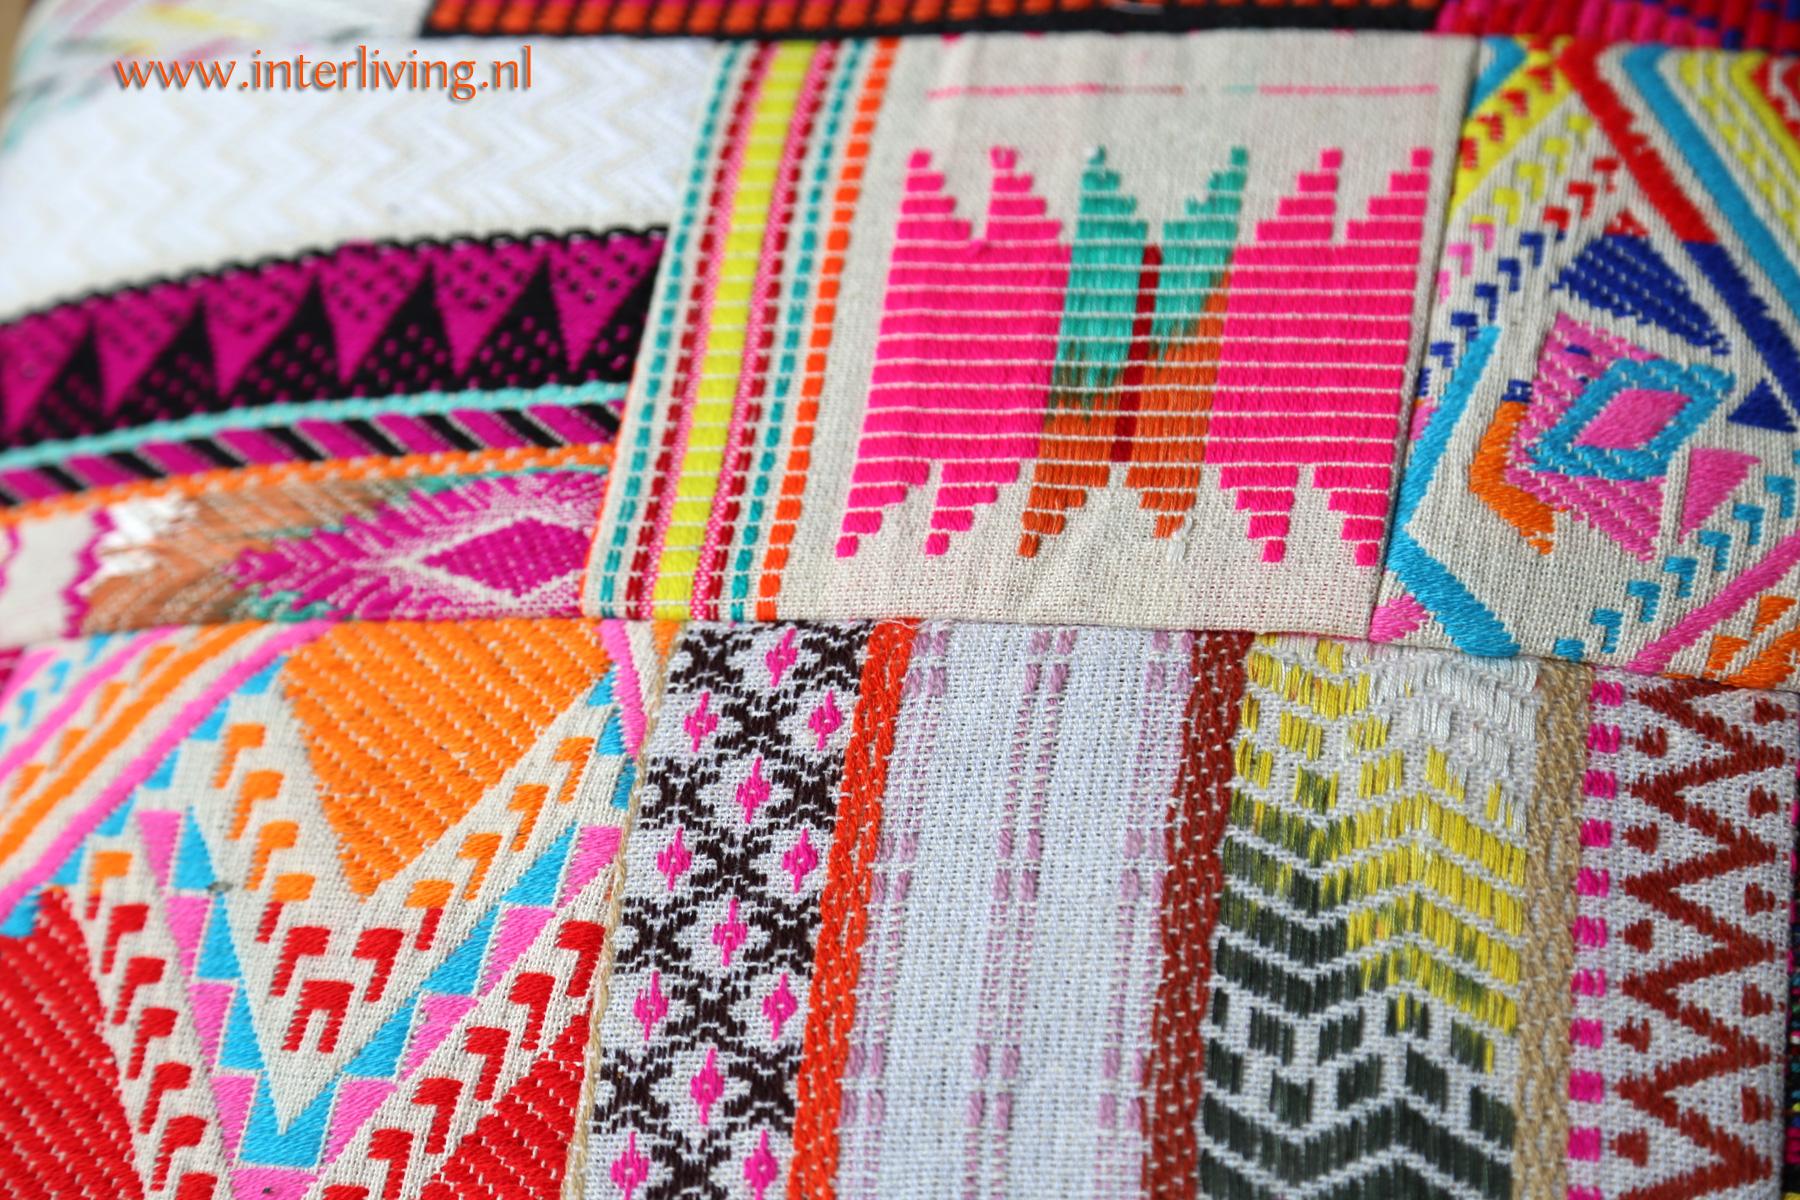 Hippy sjiek patchwork kussen met ethnic & tribal borduurwerk - bont gekleurd